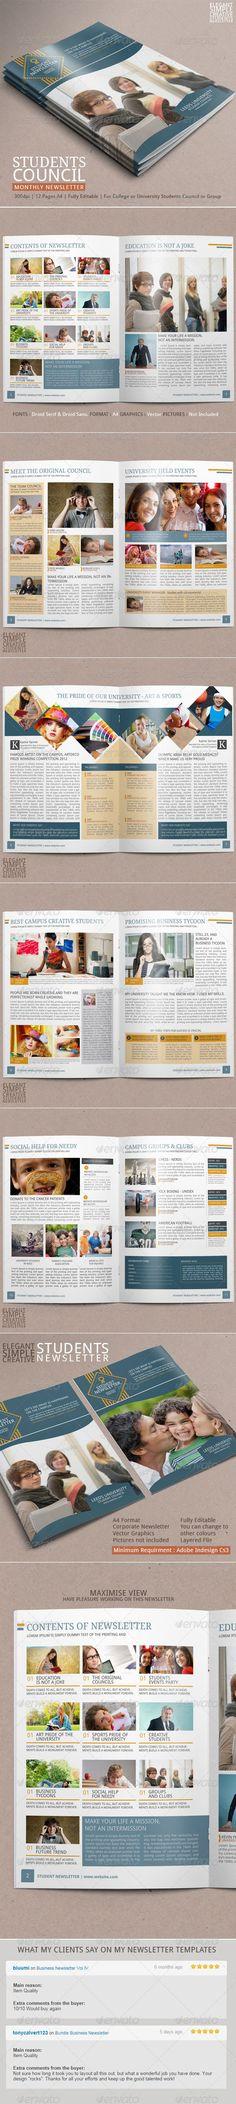 Newsletter Ideas Switz Newsletter Template #newsletterIdeas - news letter formats